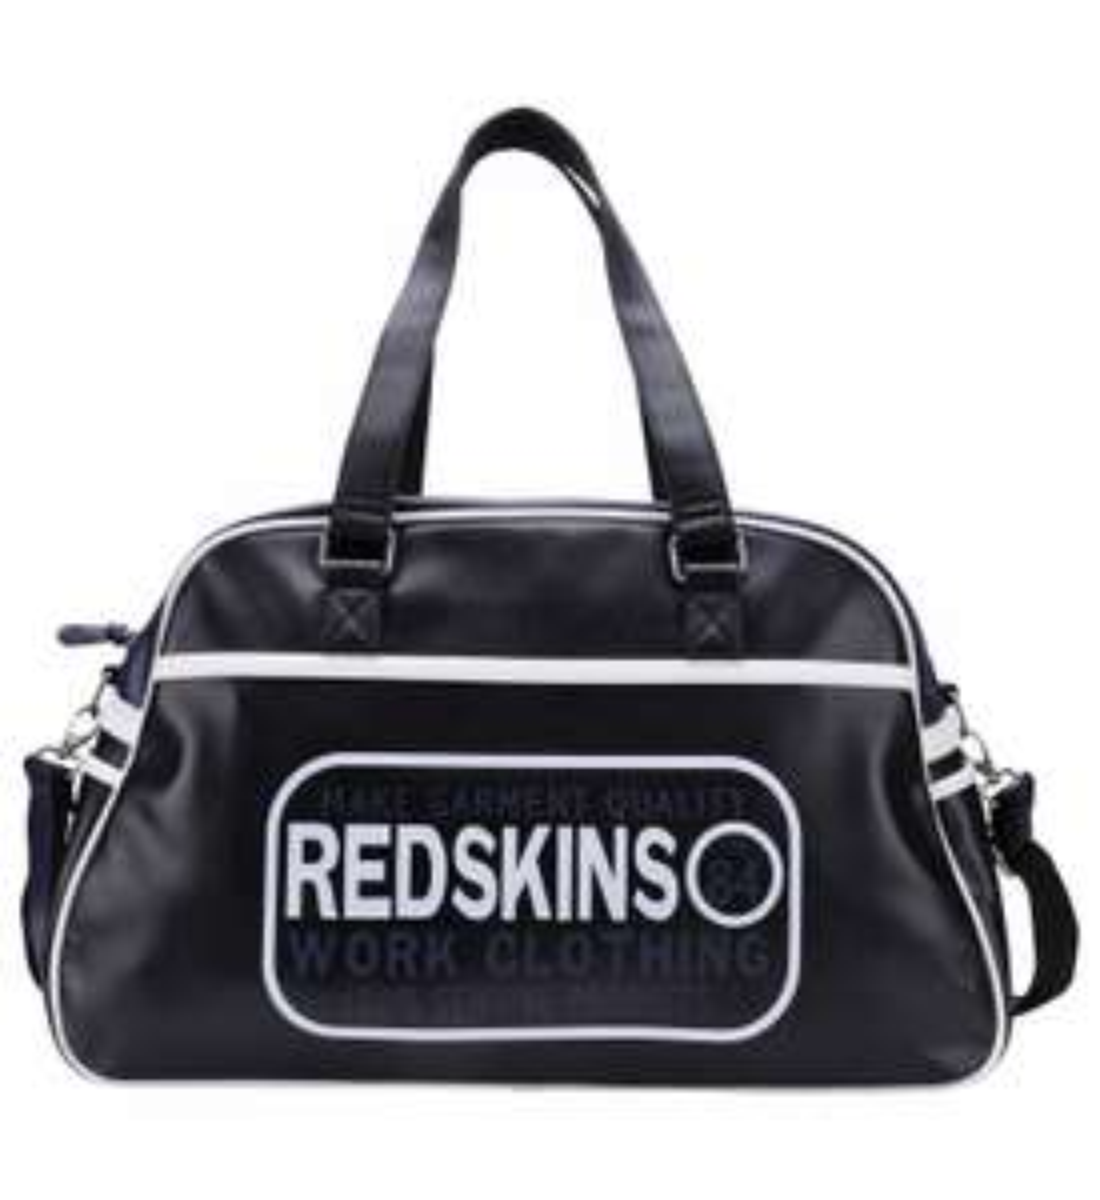 Sacs et bagages jusqu'à -50% - Ex : sac week end Redskins